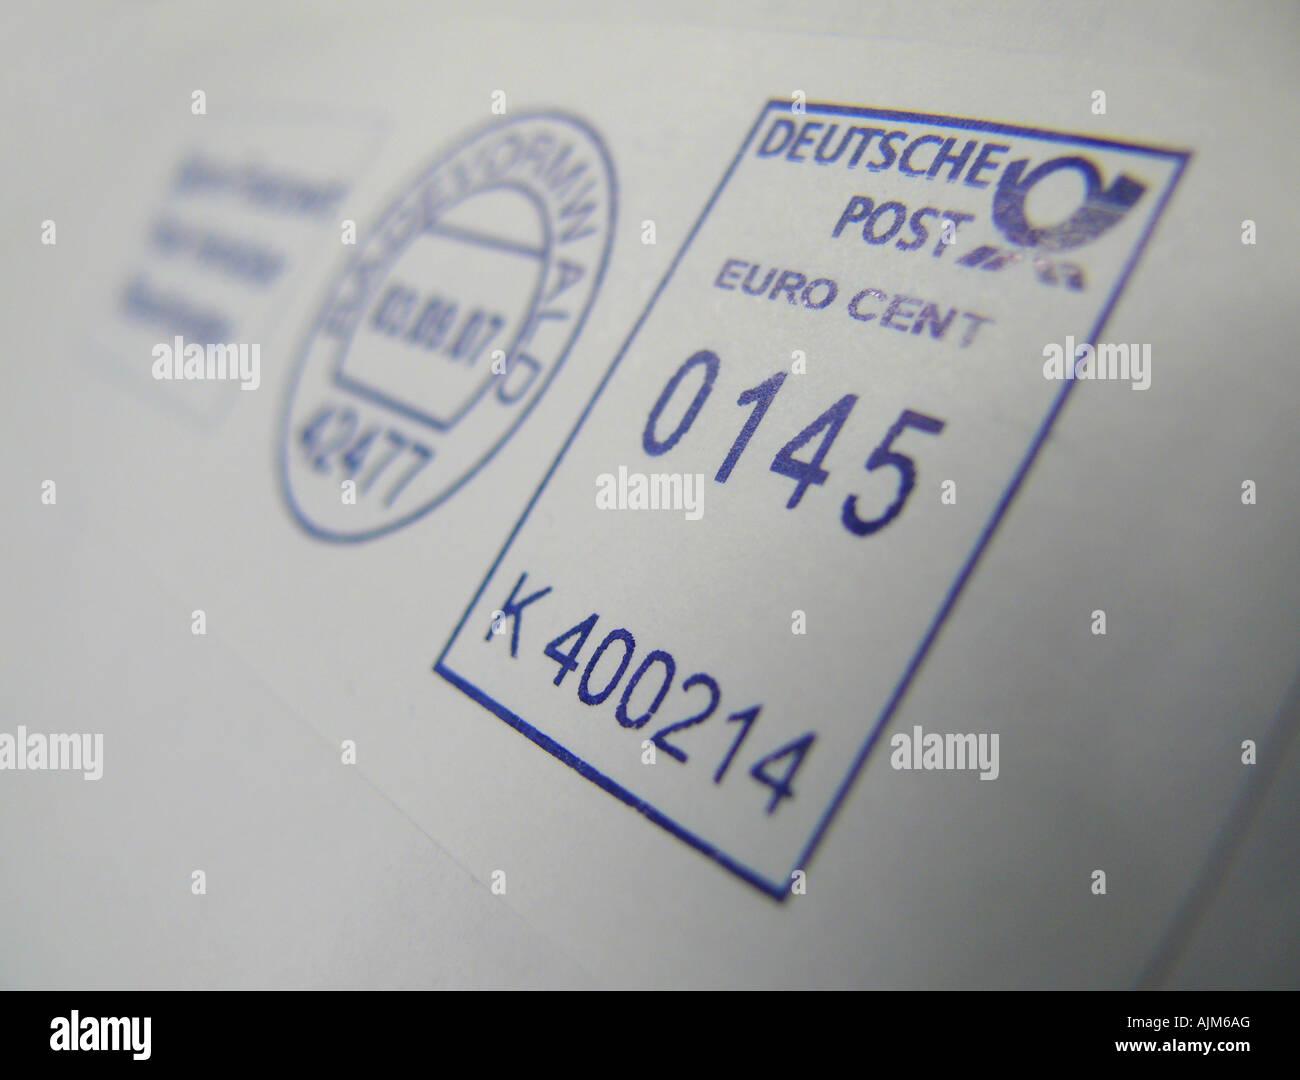 postmark 145 Cent for large letter, Germany - Stock Image